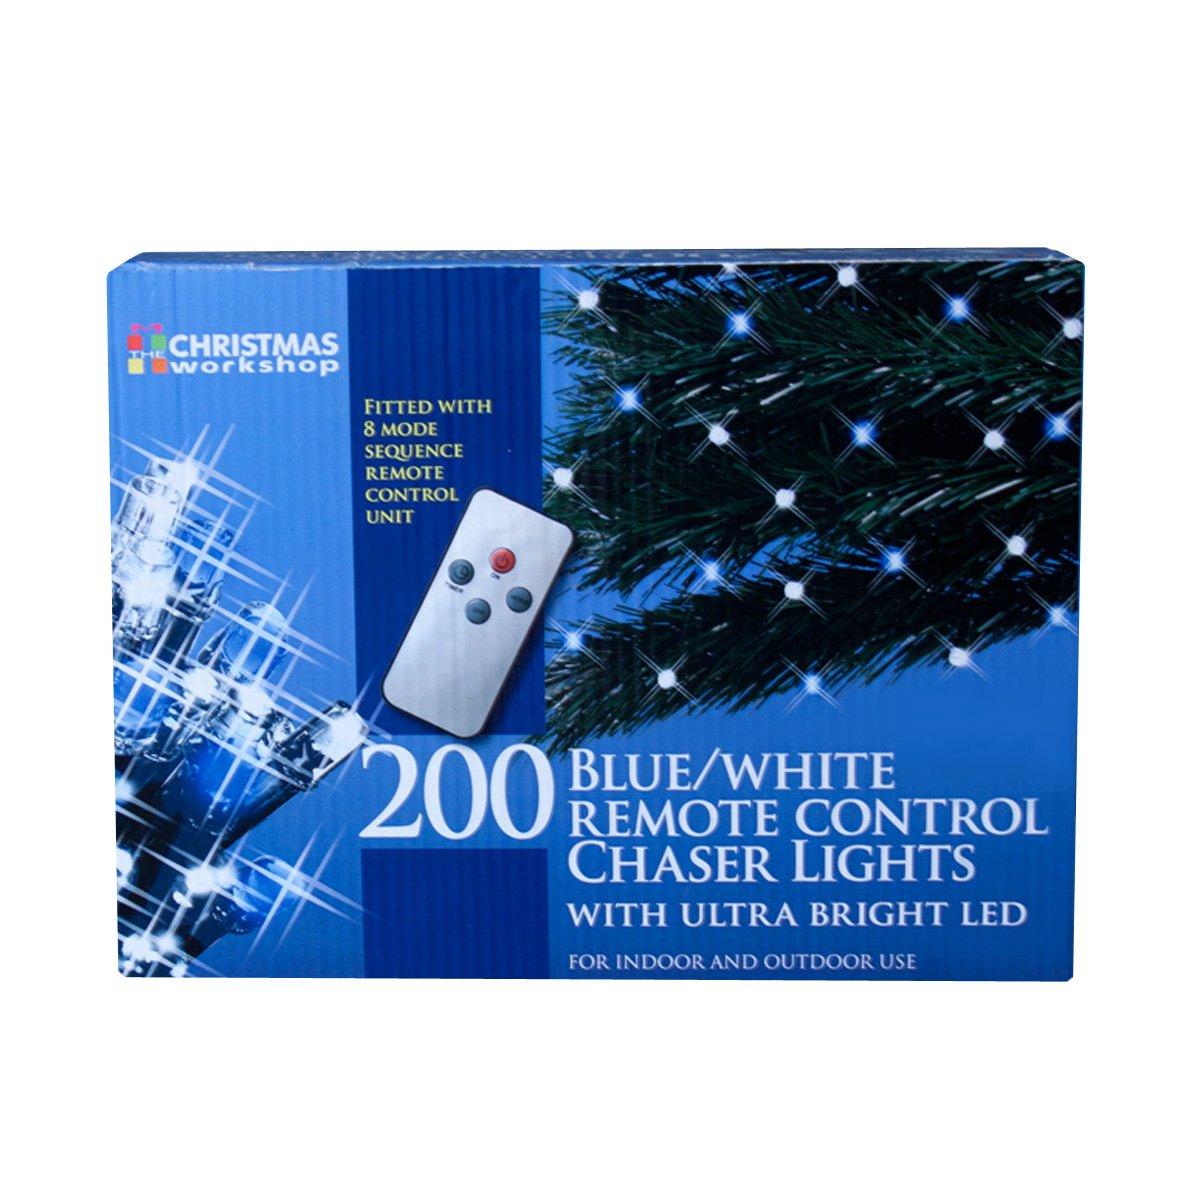 The Christmas Workshop 200 Remote Control LED Chaser Lights, Blue ...